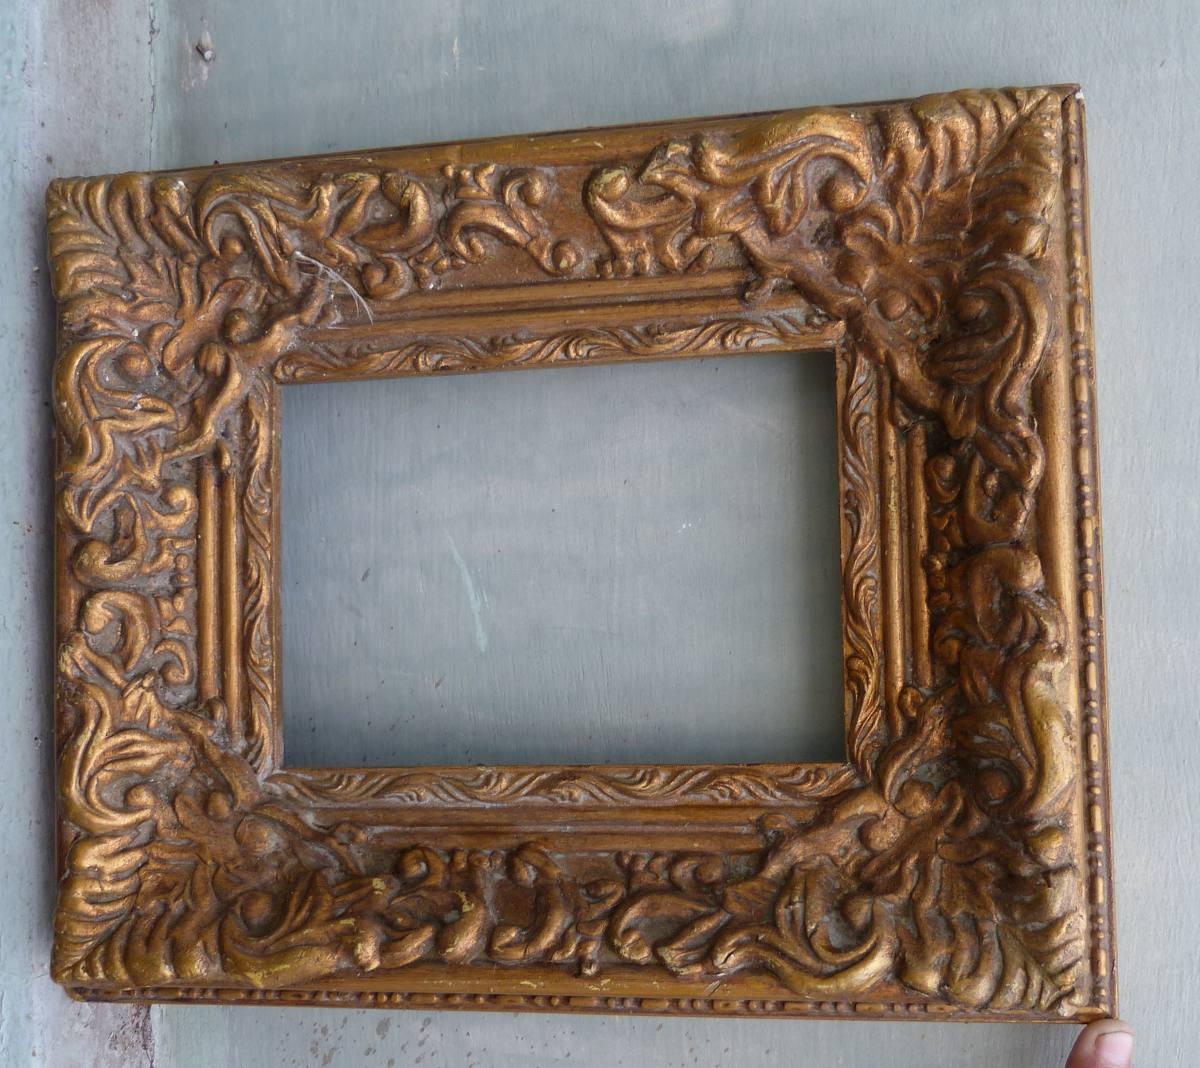 Antigua marco europeo en madera tallada y dorada u s - Pintura dorada para madera ...